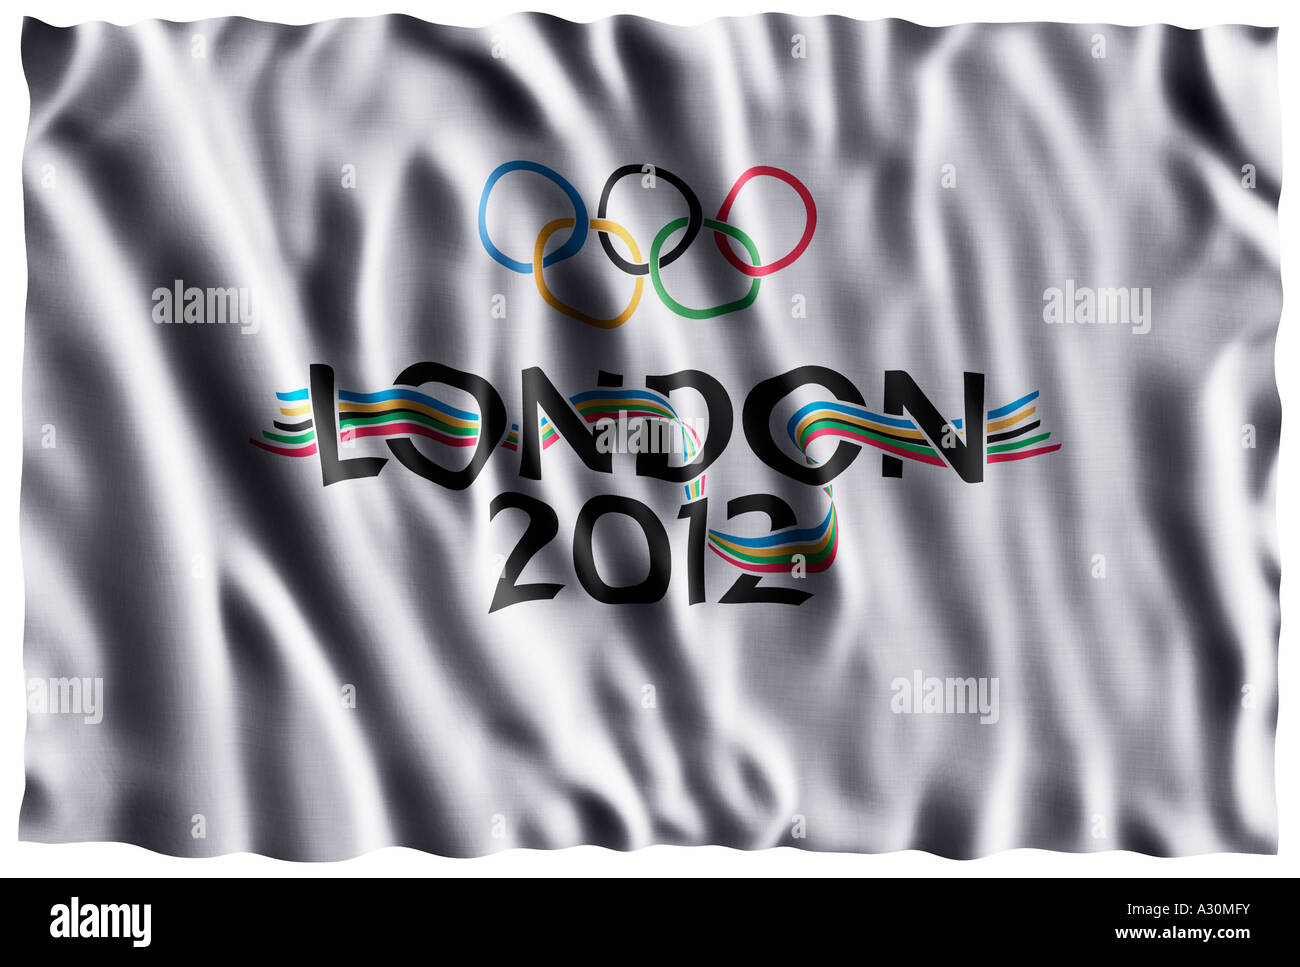 London 2012 Olympic flag - Stock Image